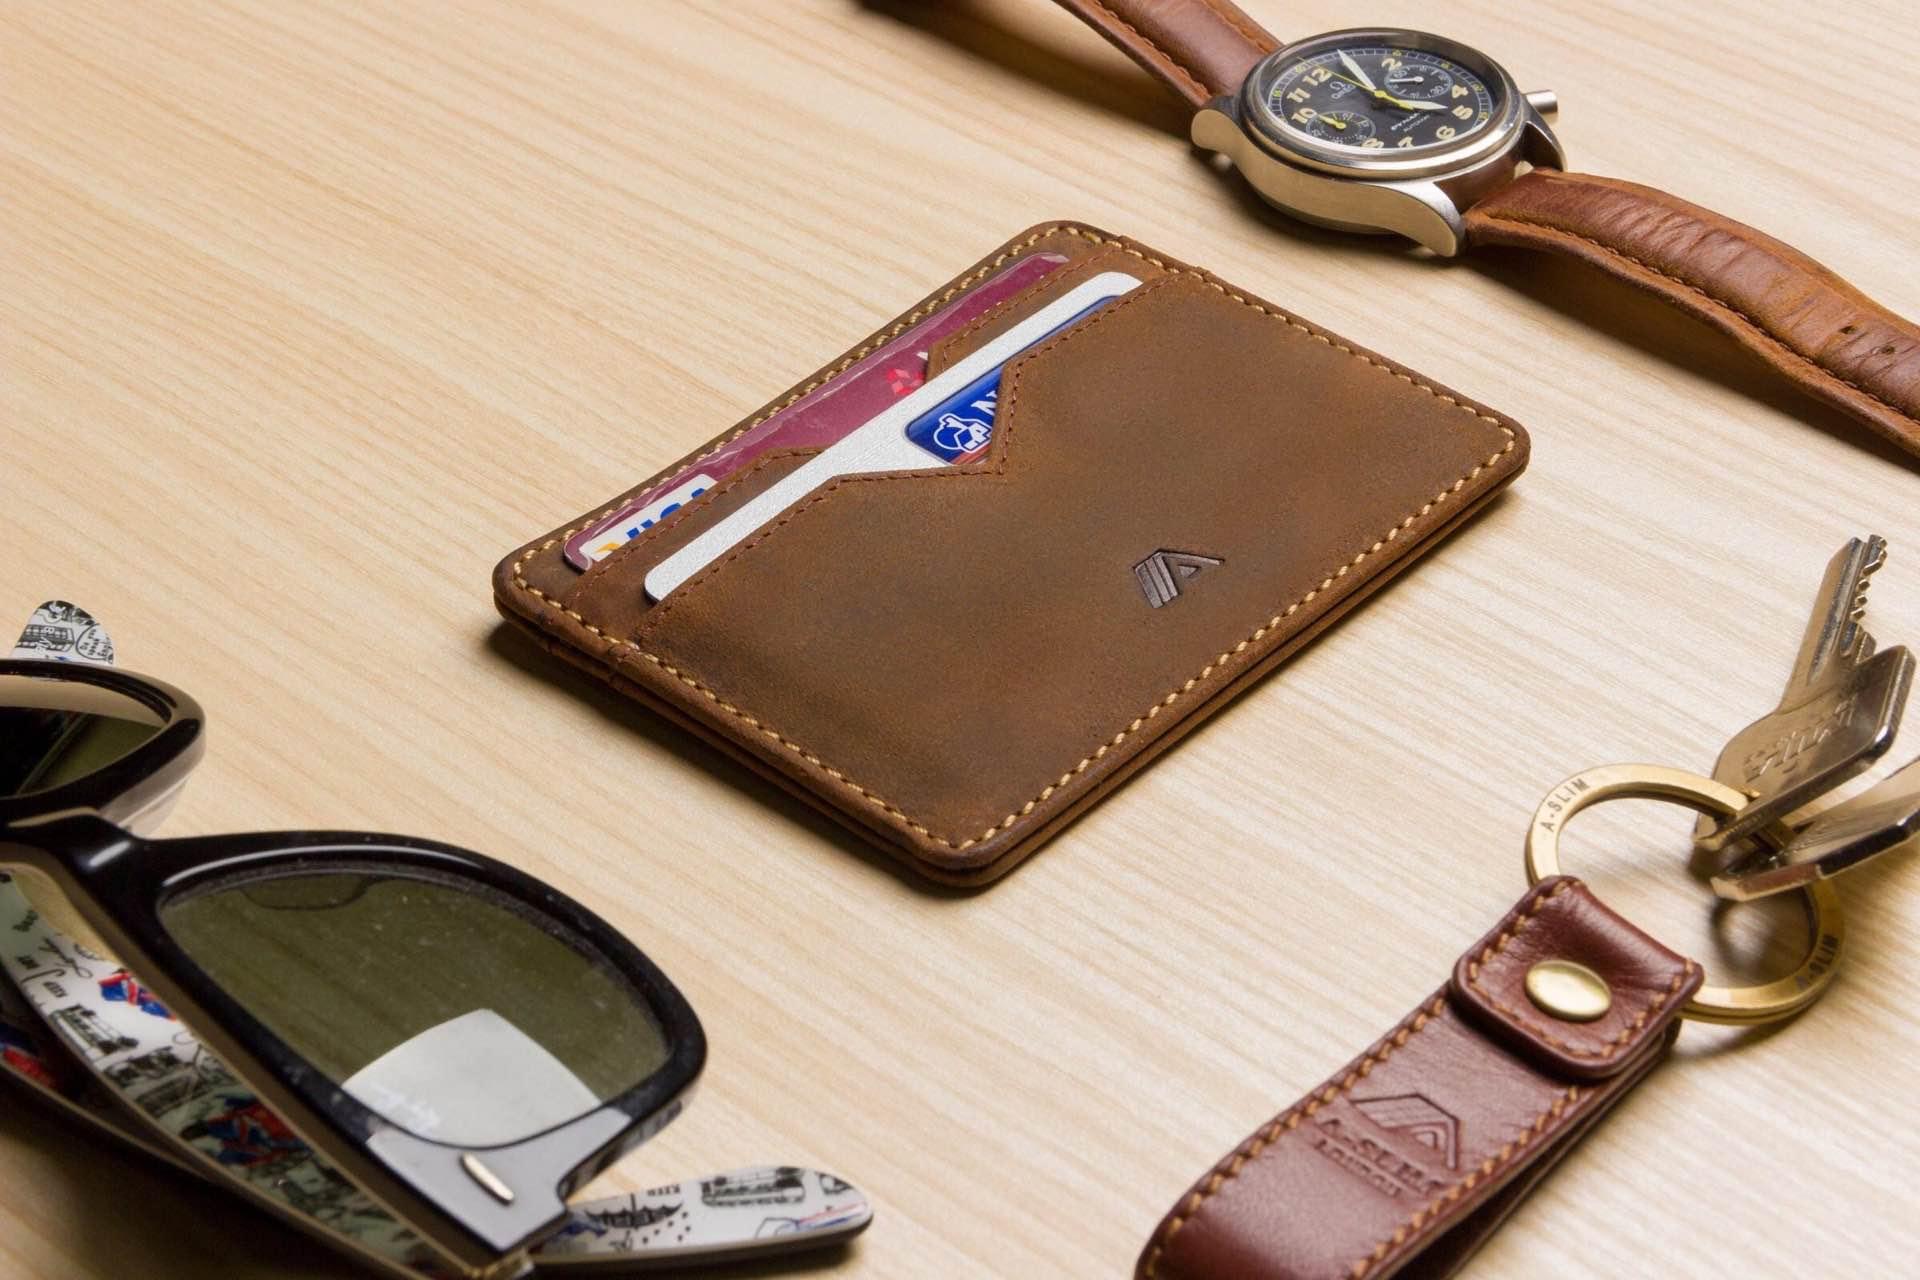 A-SLIM leather card holder. (~$40)